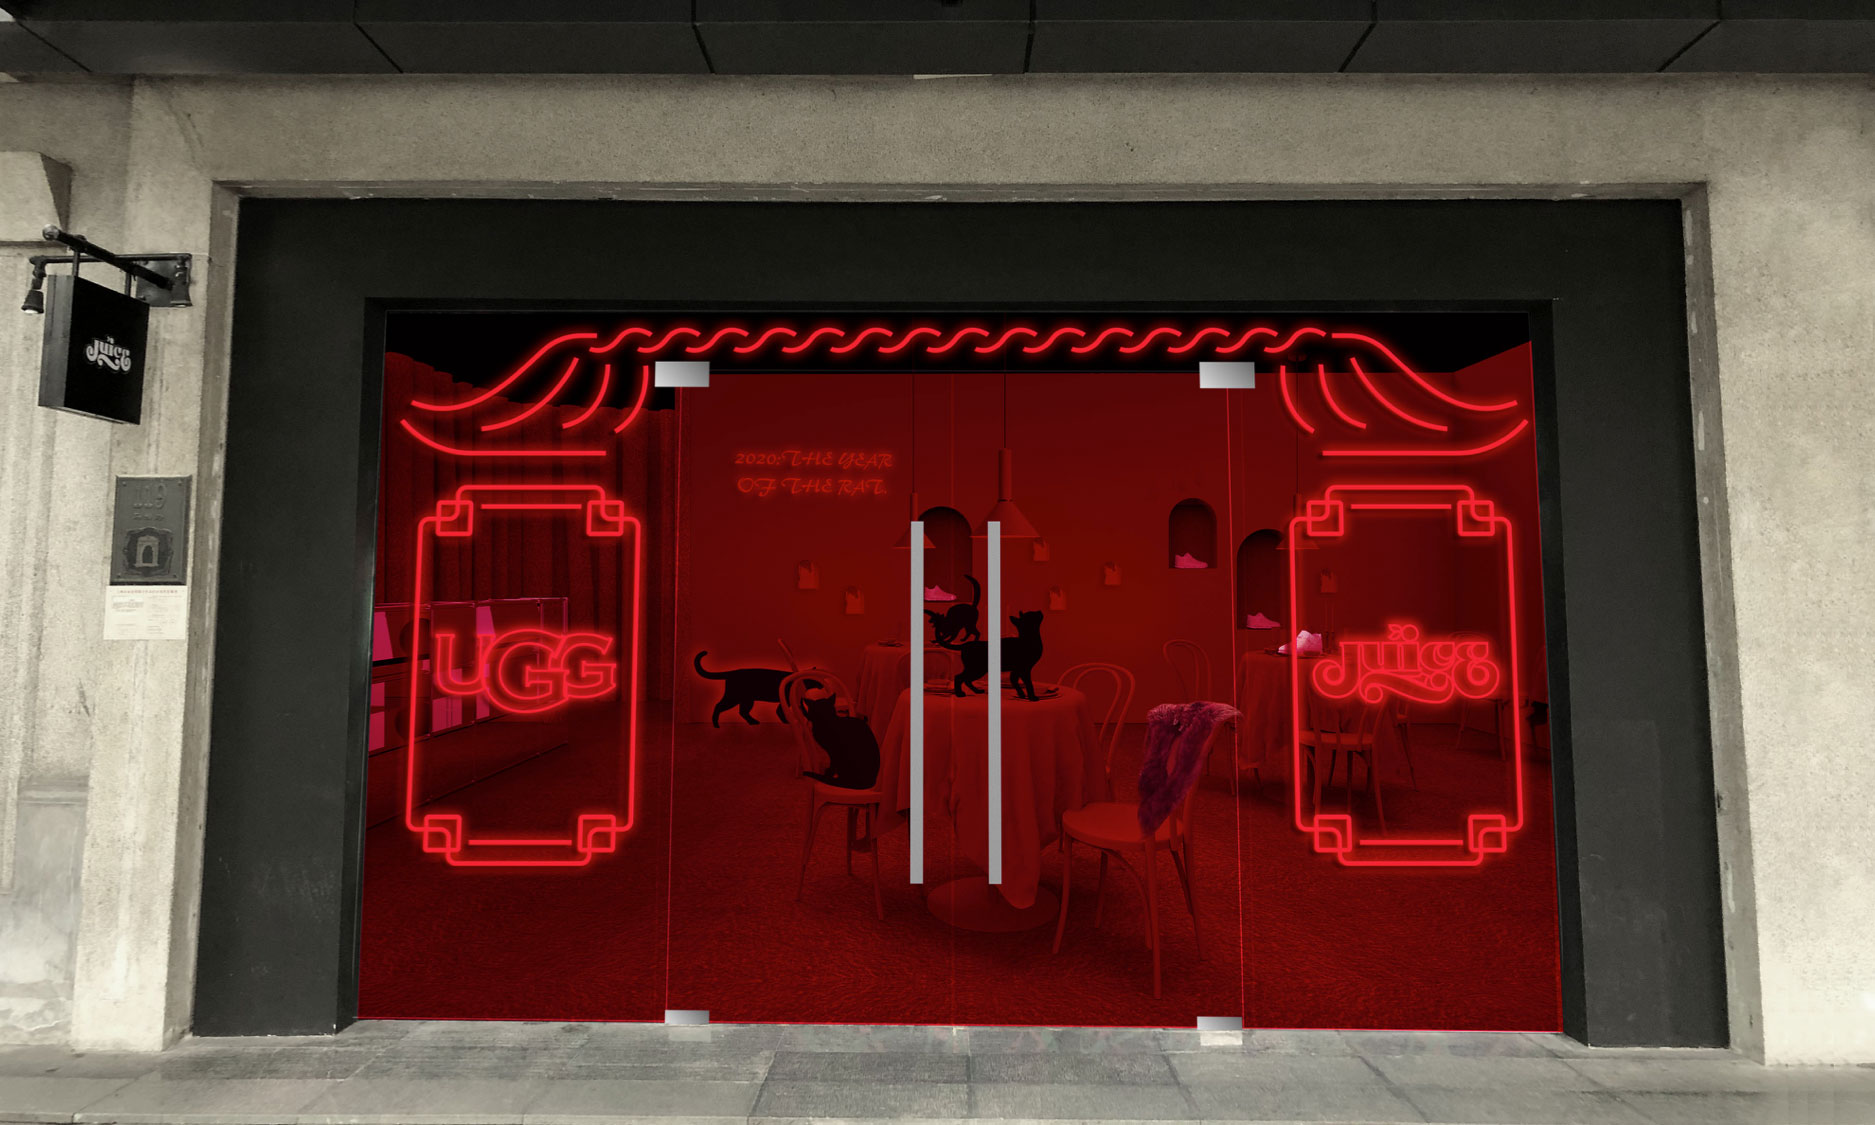 JUICE THE BOX 上海开设「UGG CA805 x 2020」限时概念店